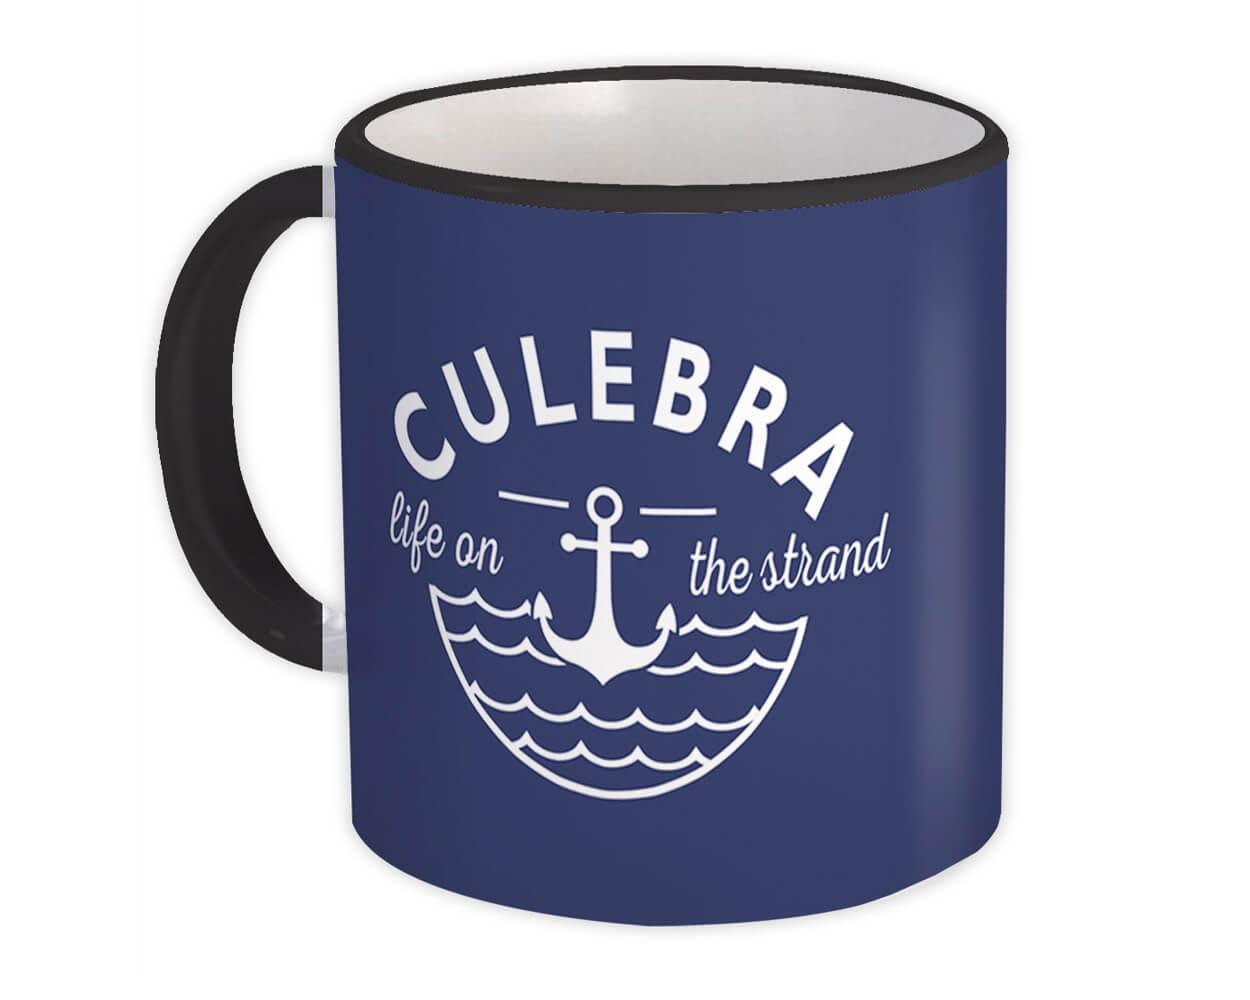 Culebra Life on the Strand : Gift Mug Beach Travel Souvenir Puerto Rico